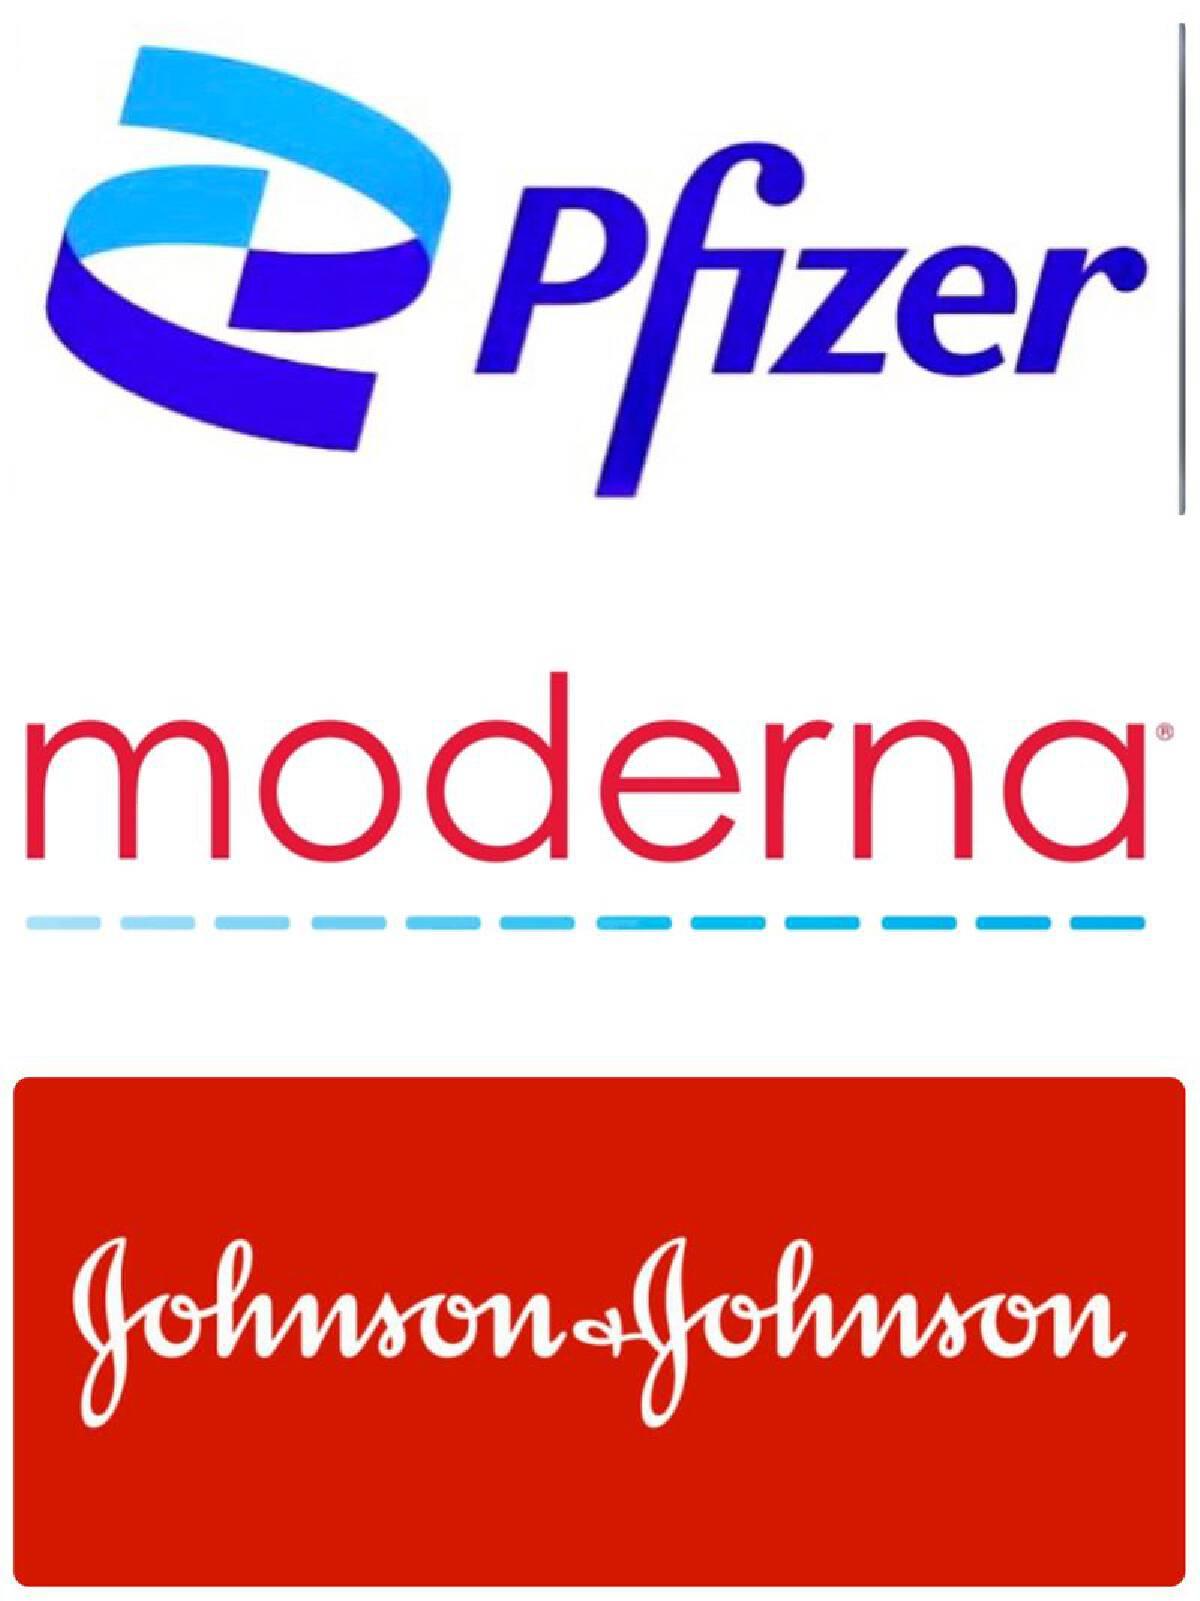 Pfizer-moderna-Johnson & Johnson ครบโดสยังติดไวรัสา่ยพันธุ์เดลตาได้